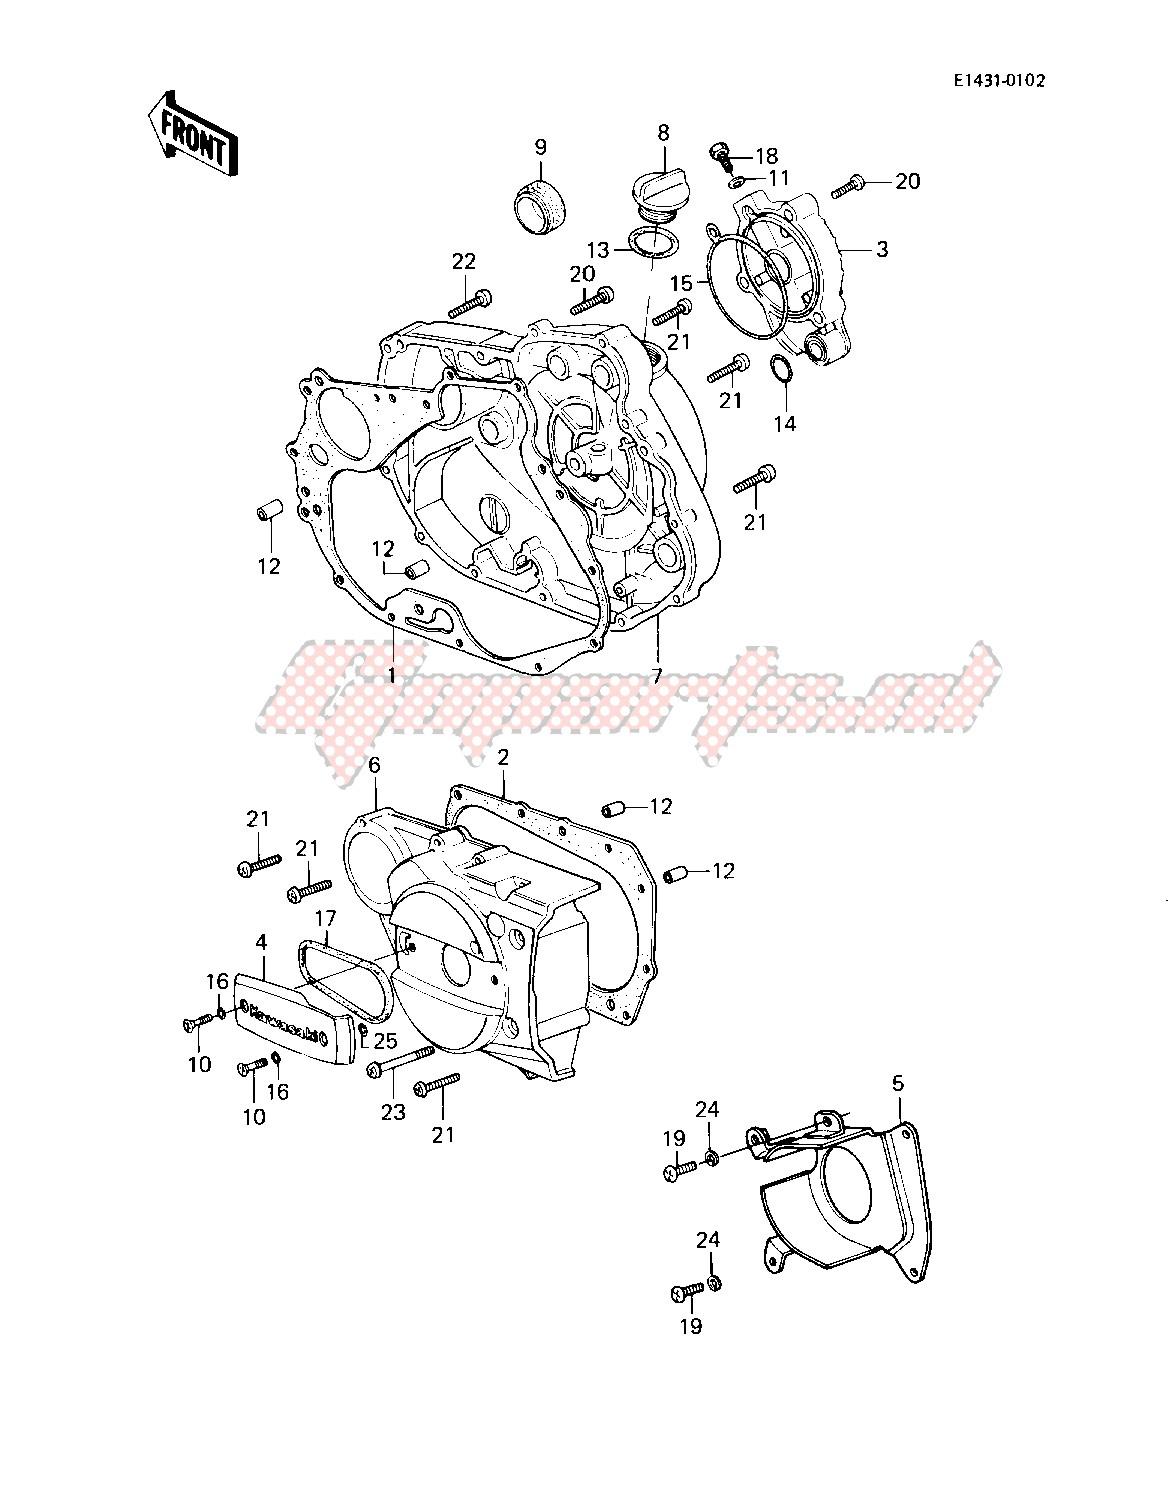 ENGINE COVERS -- 83 KLT200-C1- - image